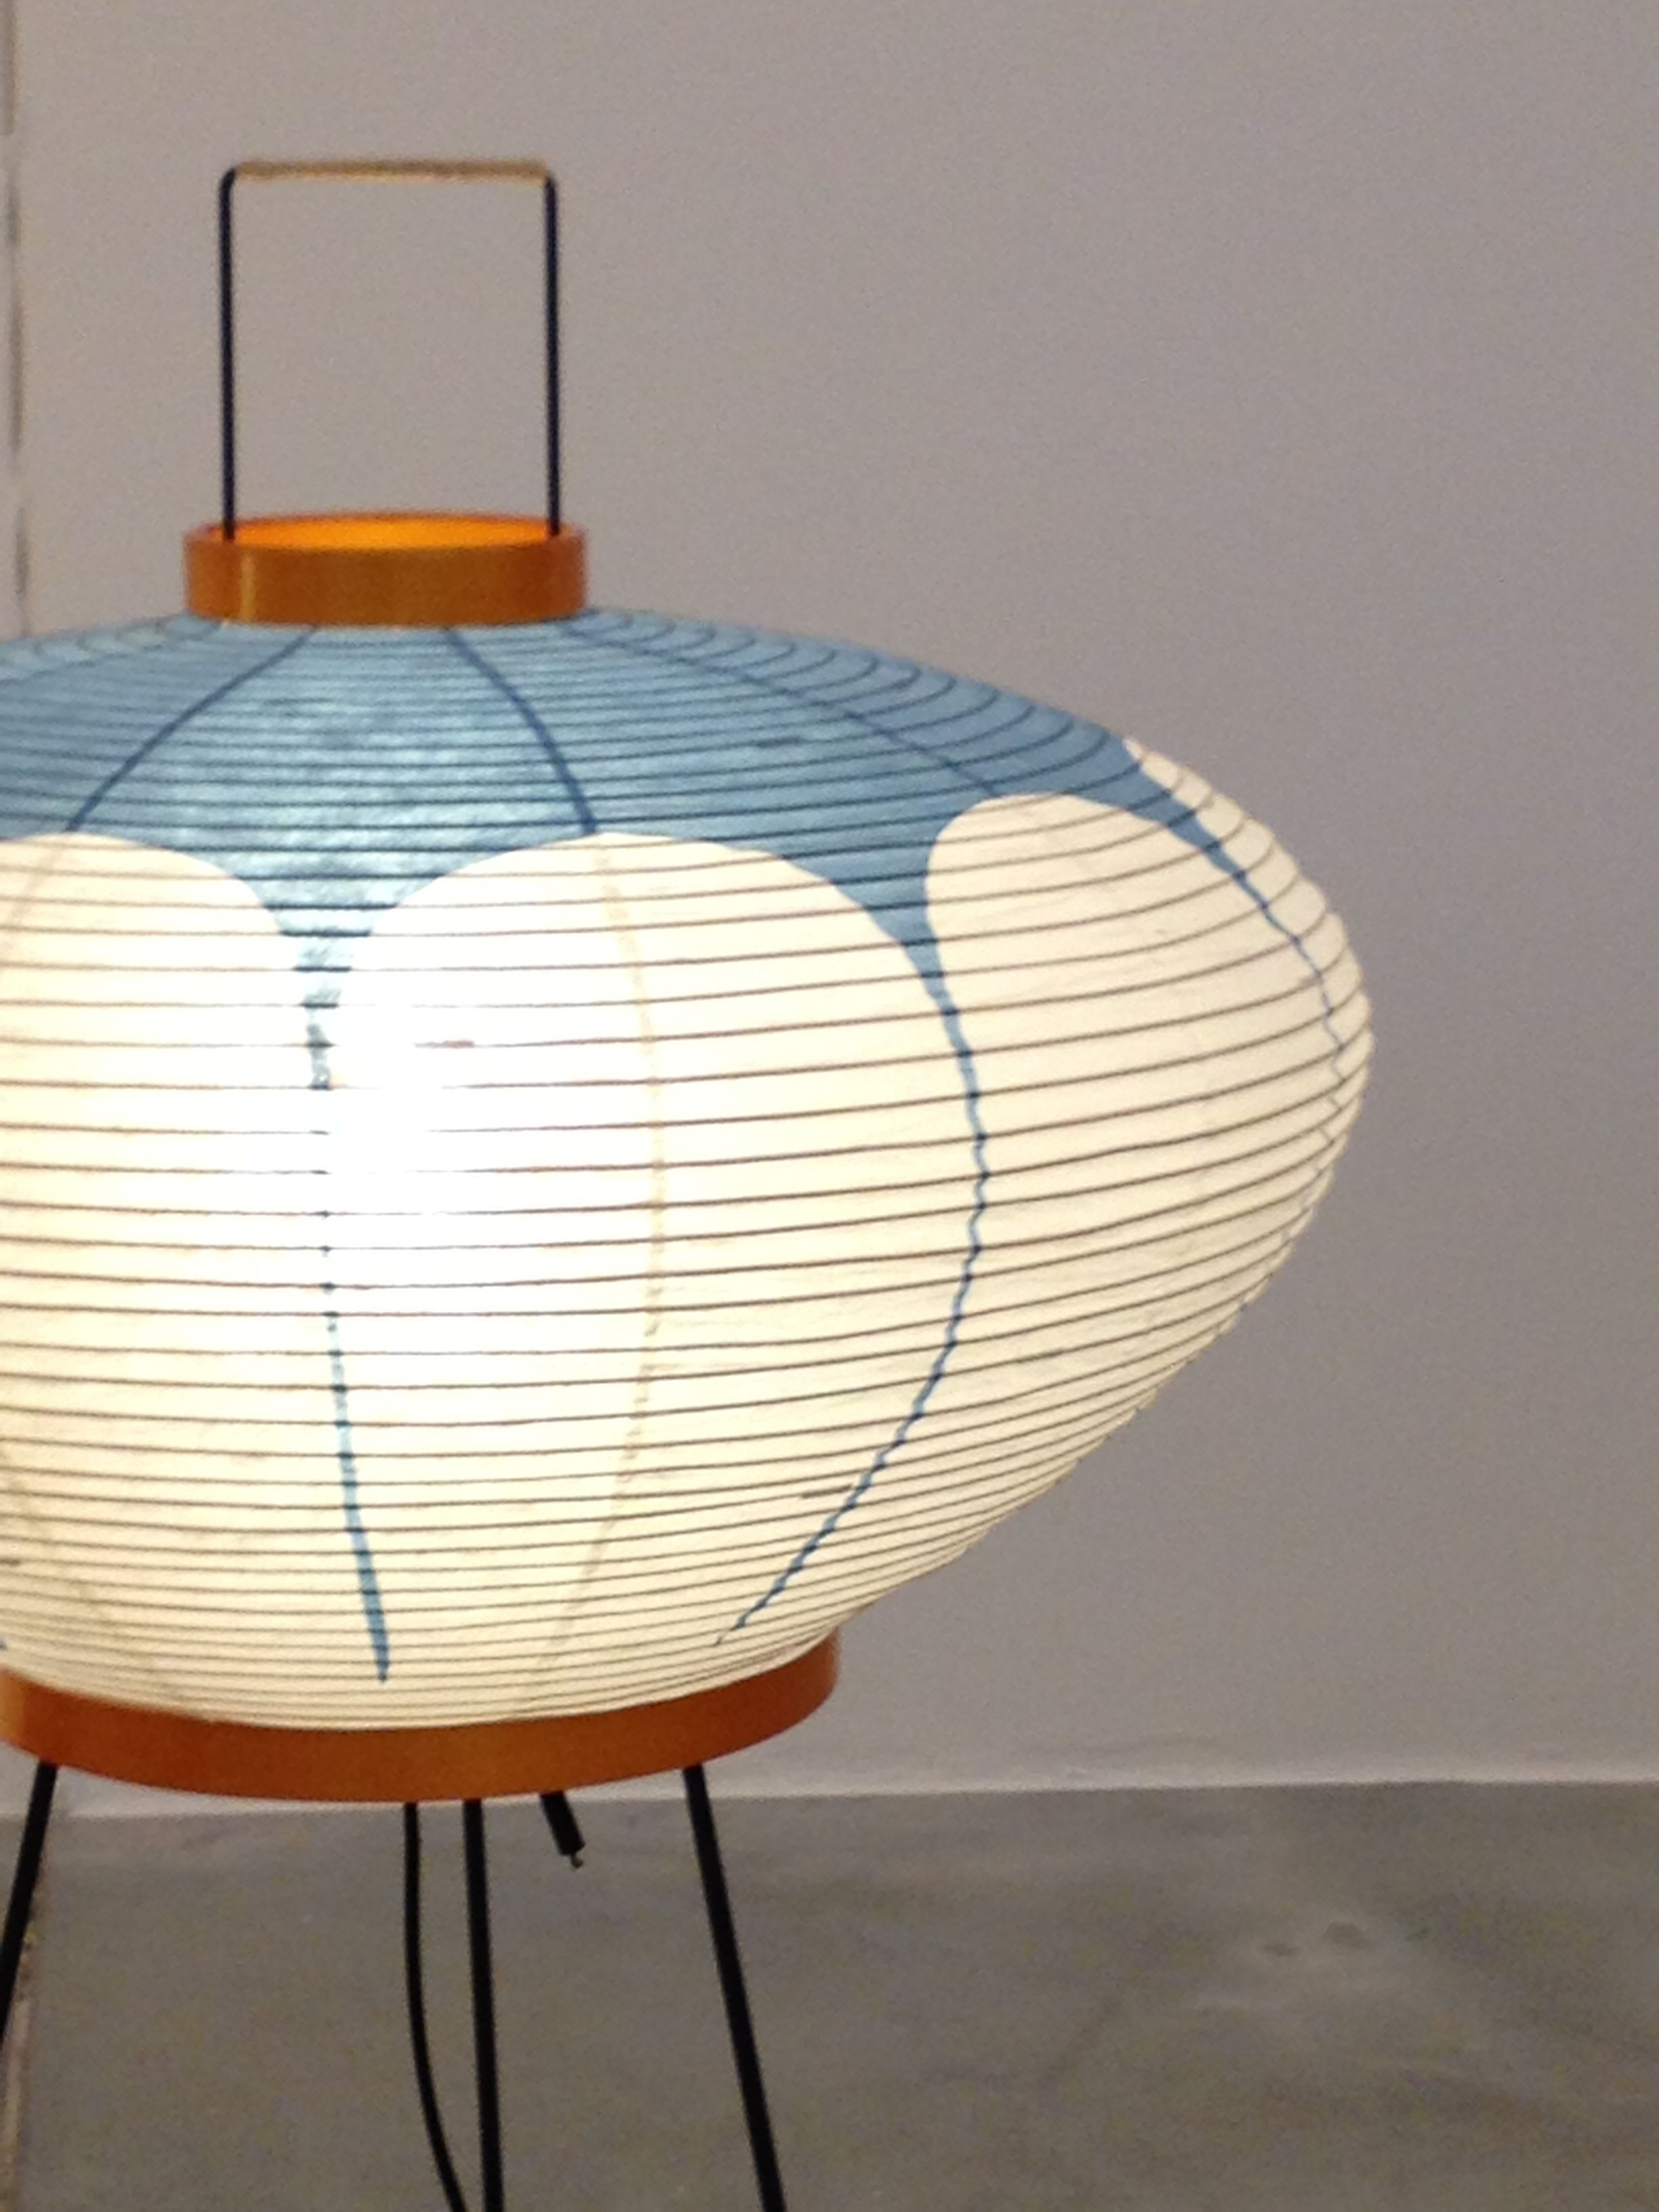 Lampe Akari Light Sculptures De Isamu Noguchi 1951 Vitra